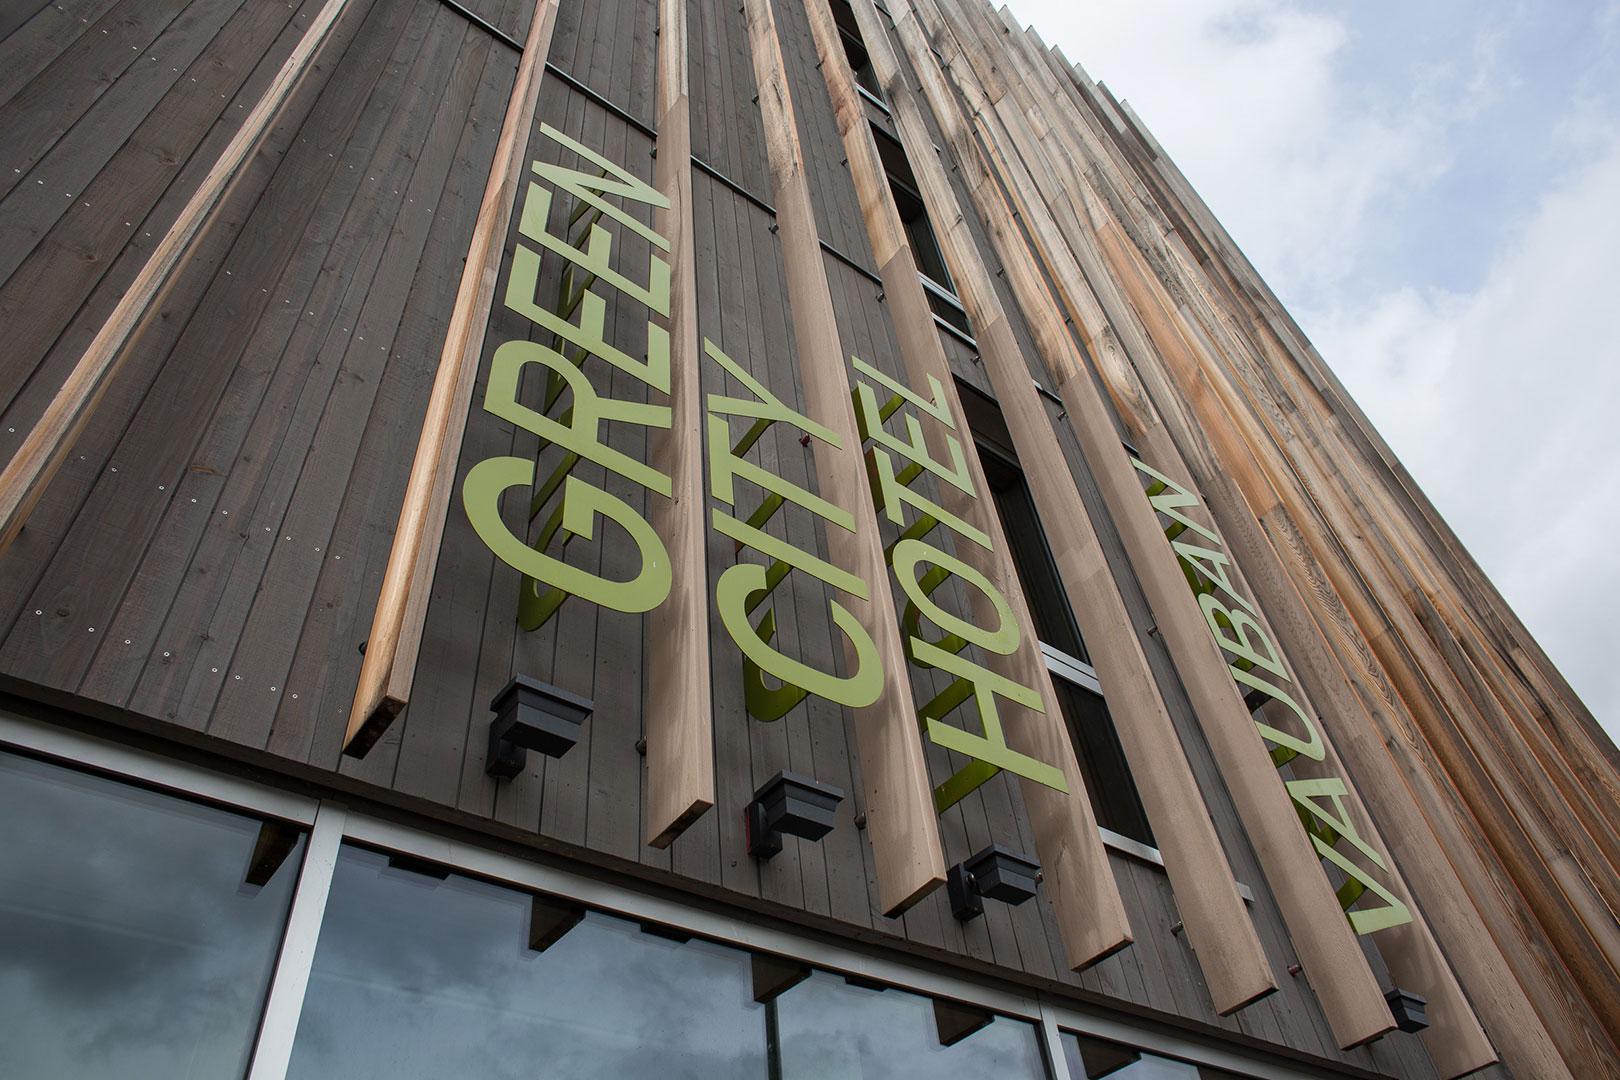 Green City Hotel Fassade